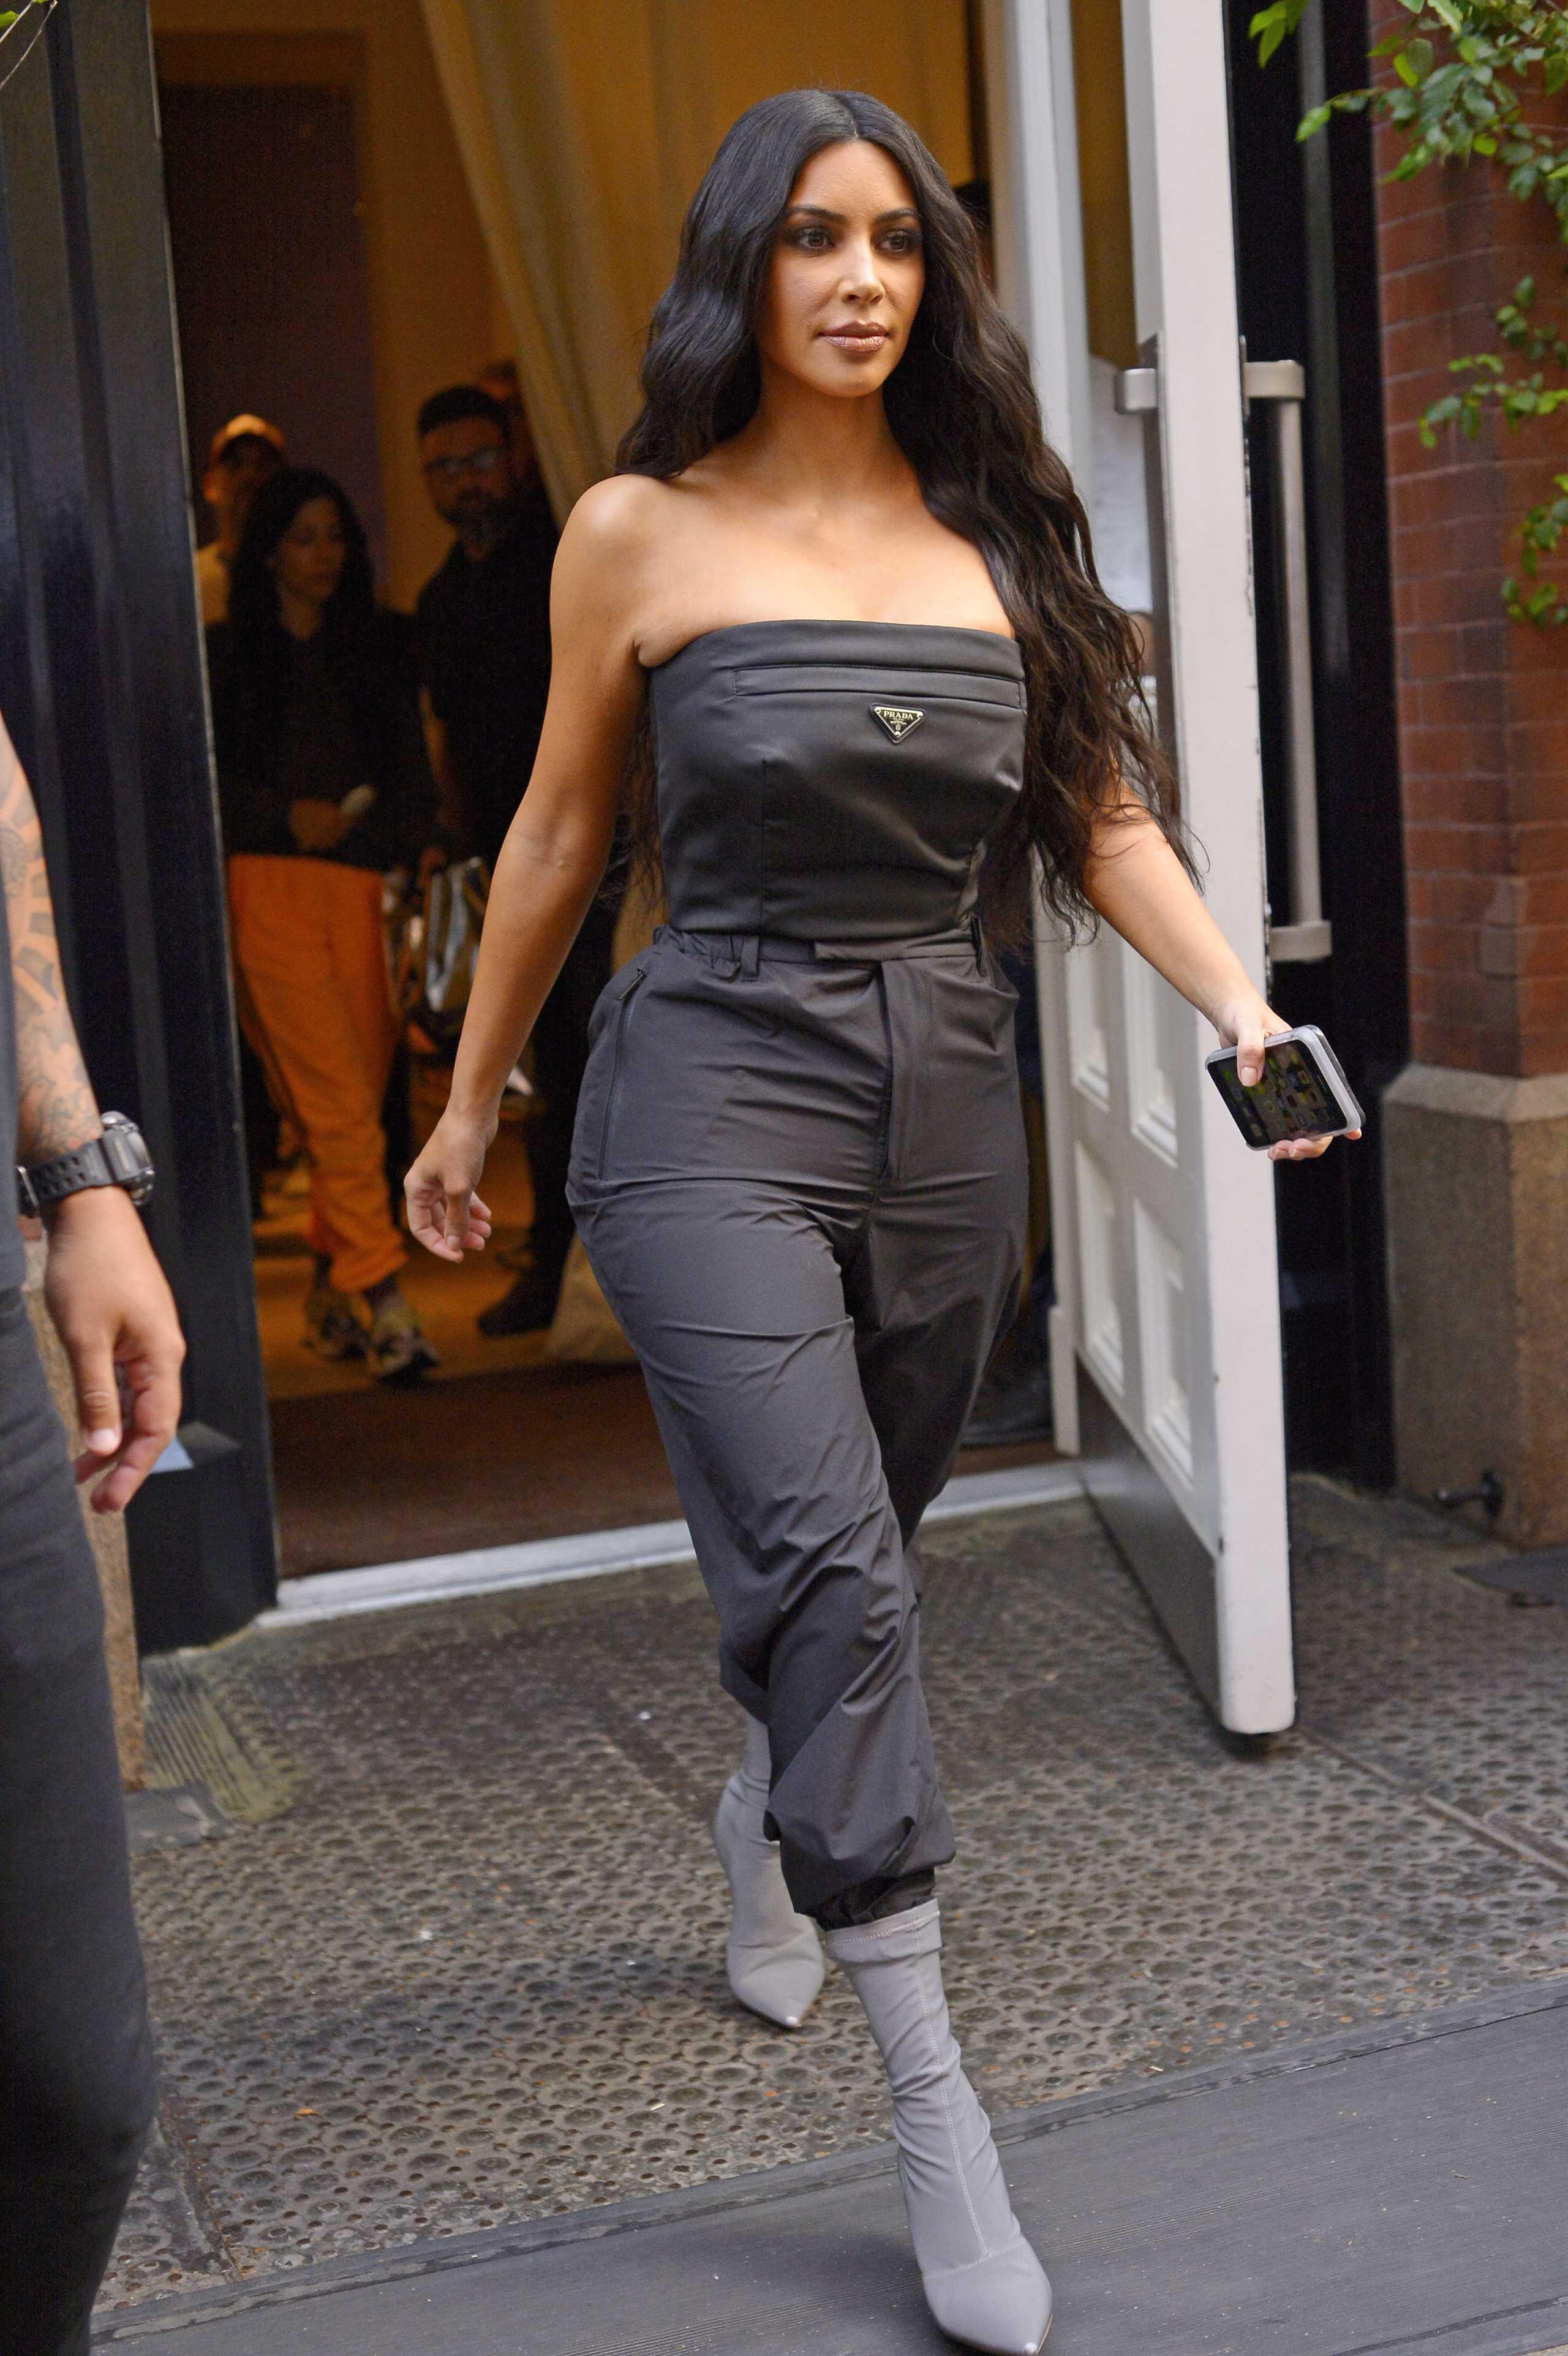 The kim kardashian photo